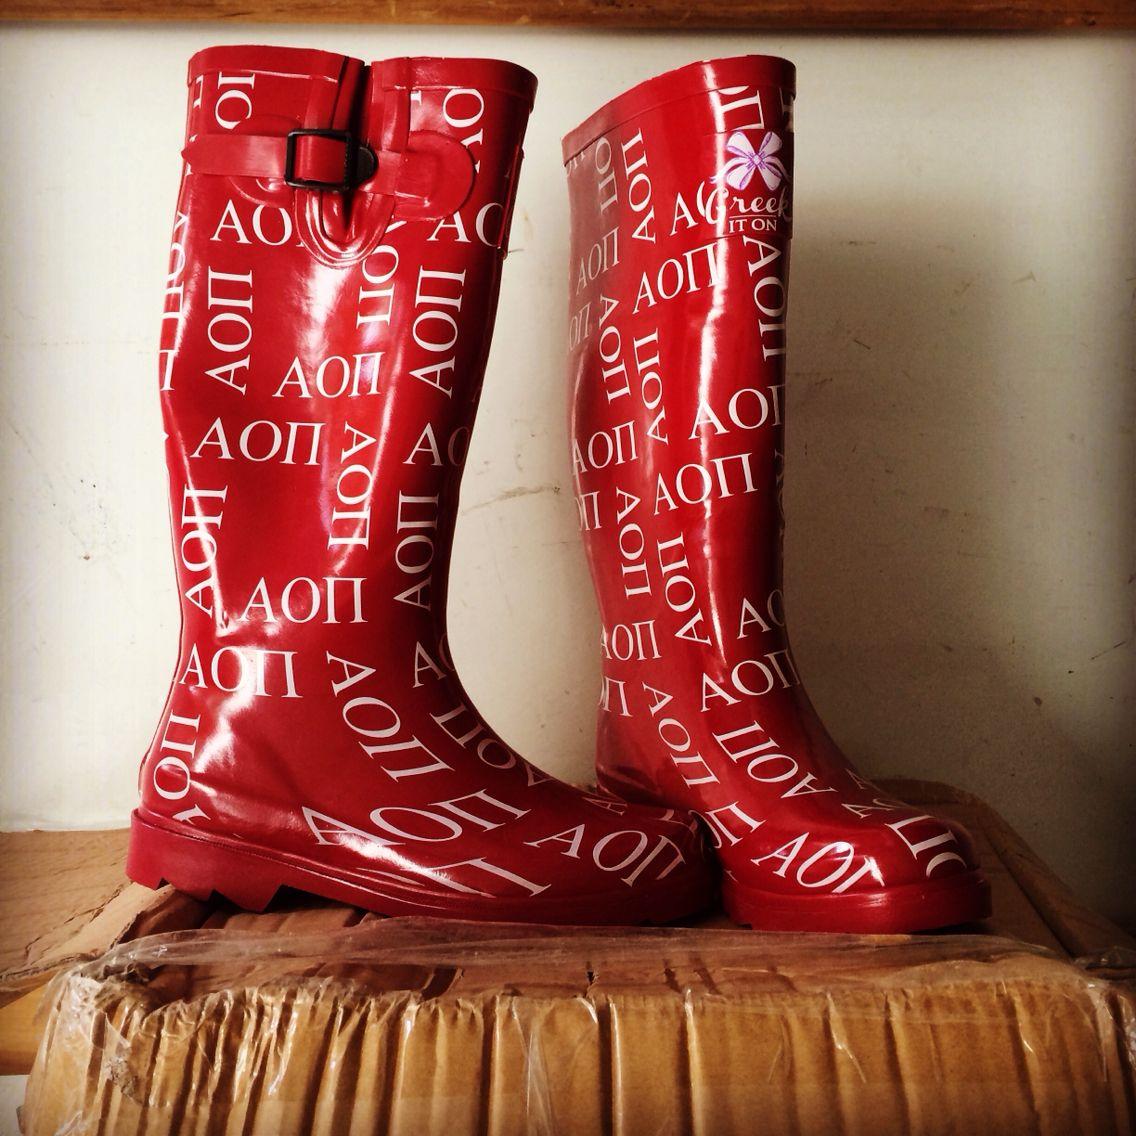 Aoii Sorority Rain Boots Boots Custom Rain Boots Rain Boots